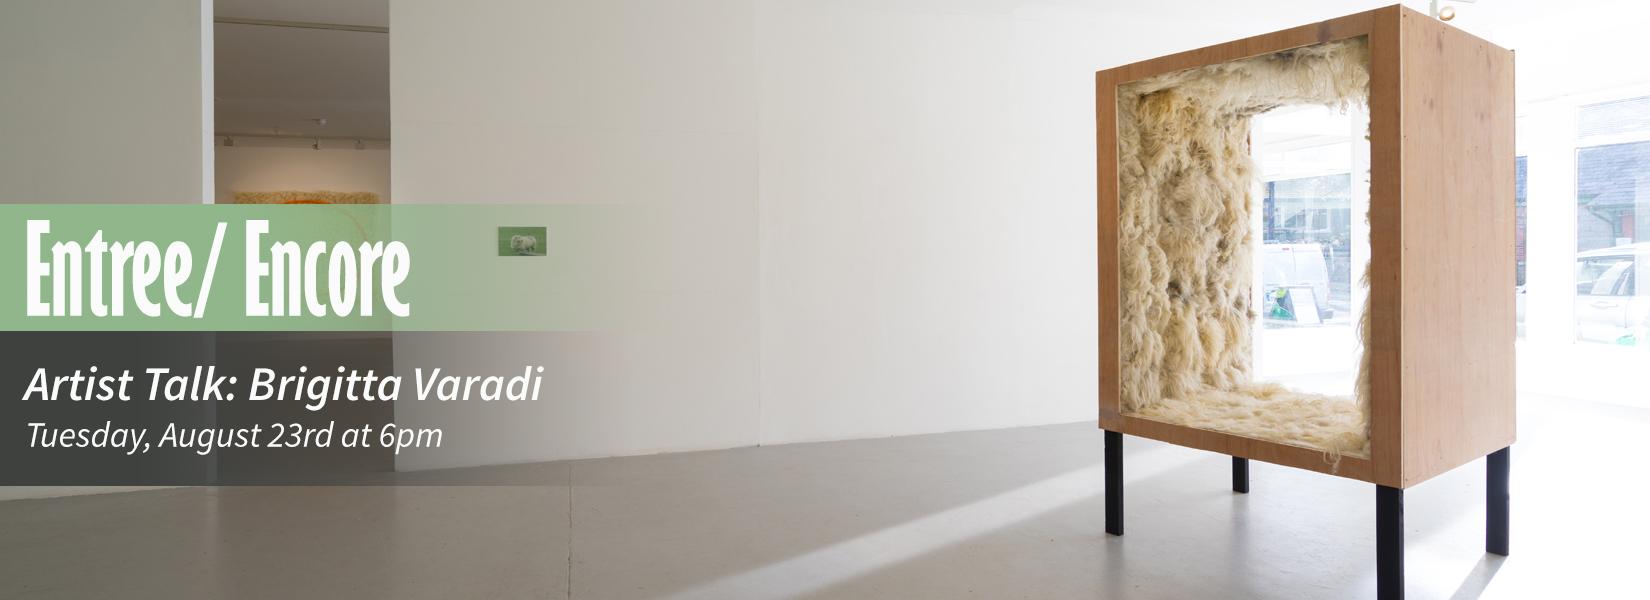 Keith Nolan Photography, MARKINGS at the Leitrim Sculpture Centre, Manorhamilton, Ireland;  Supported by Leitrim Sculpture Centre Fellowship and Artist in Residence Programme, Arts Council of Ireland, Leitrim County Council Art Office